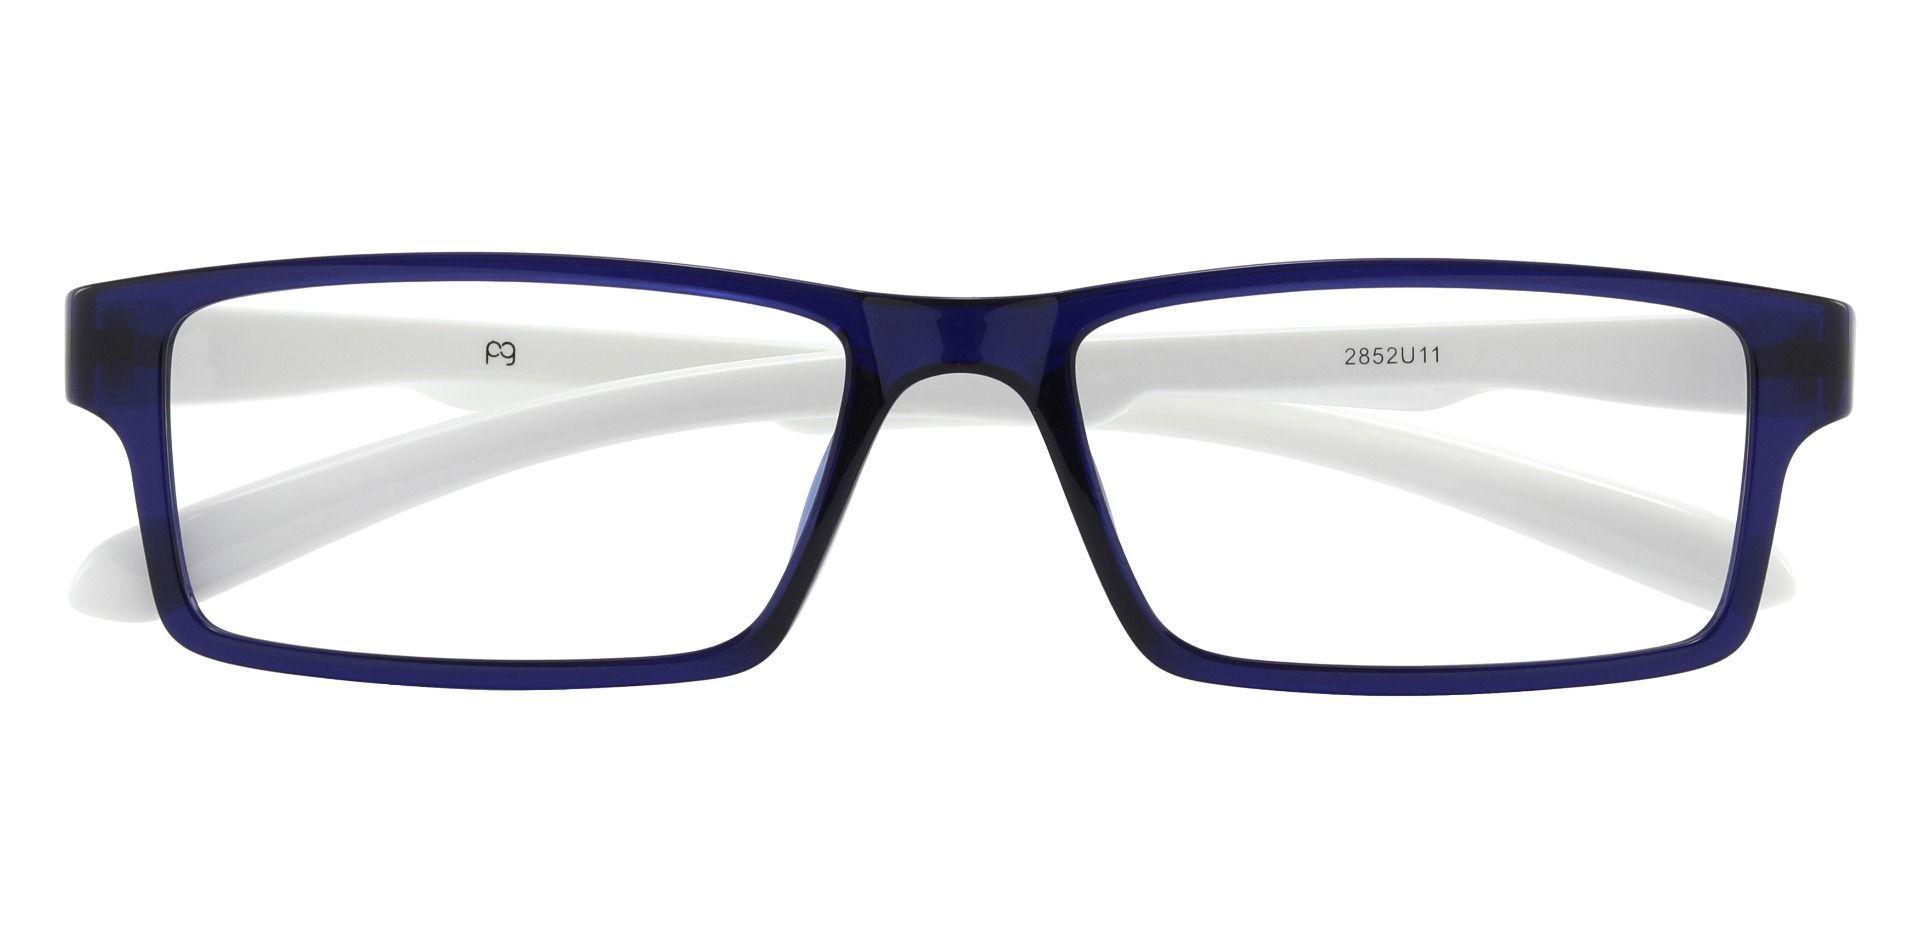 Walsh Rectangle Prescription Glasses - Blue